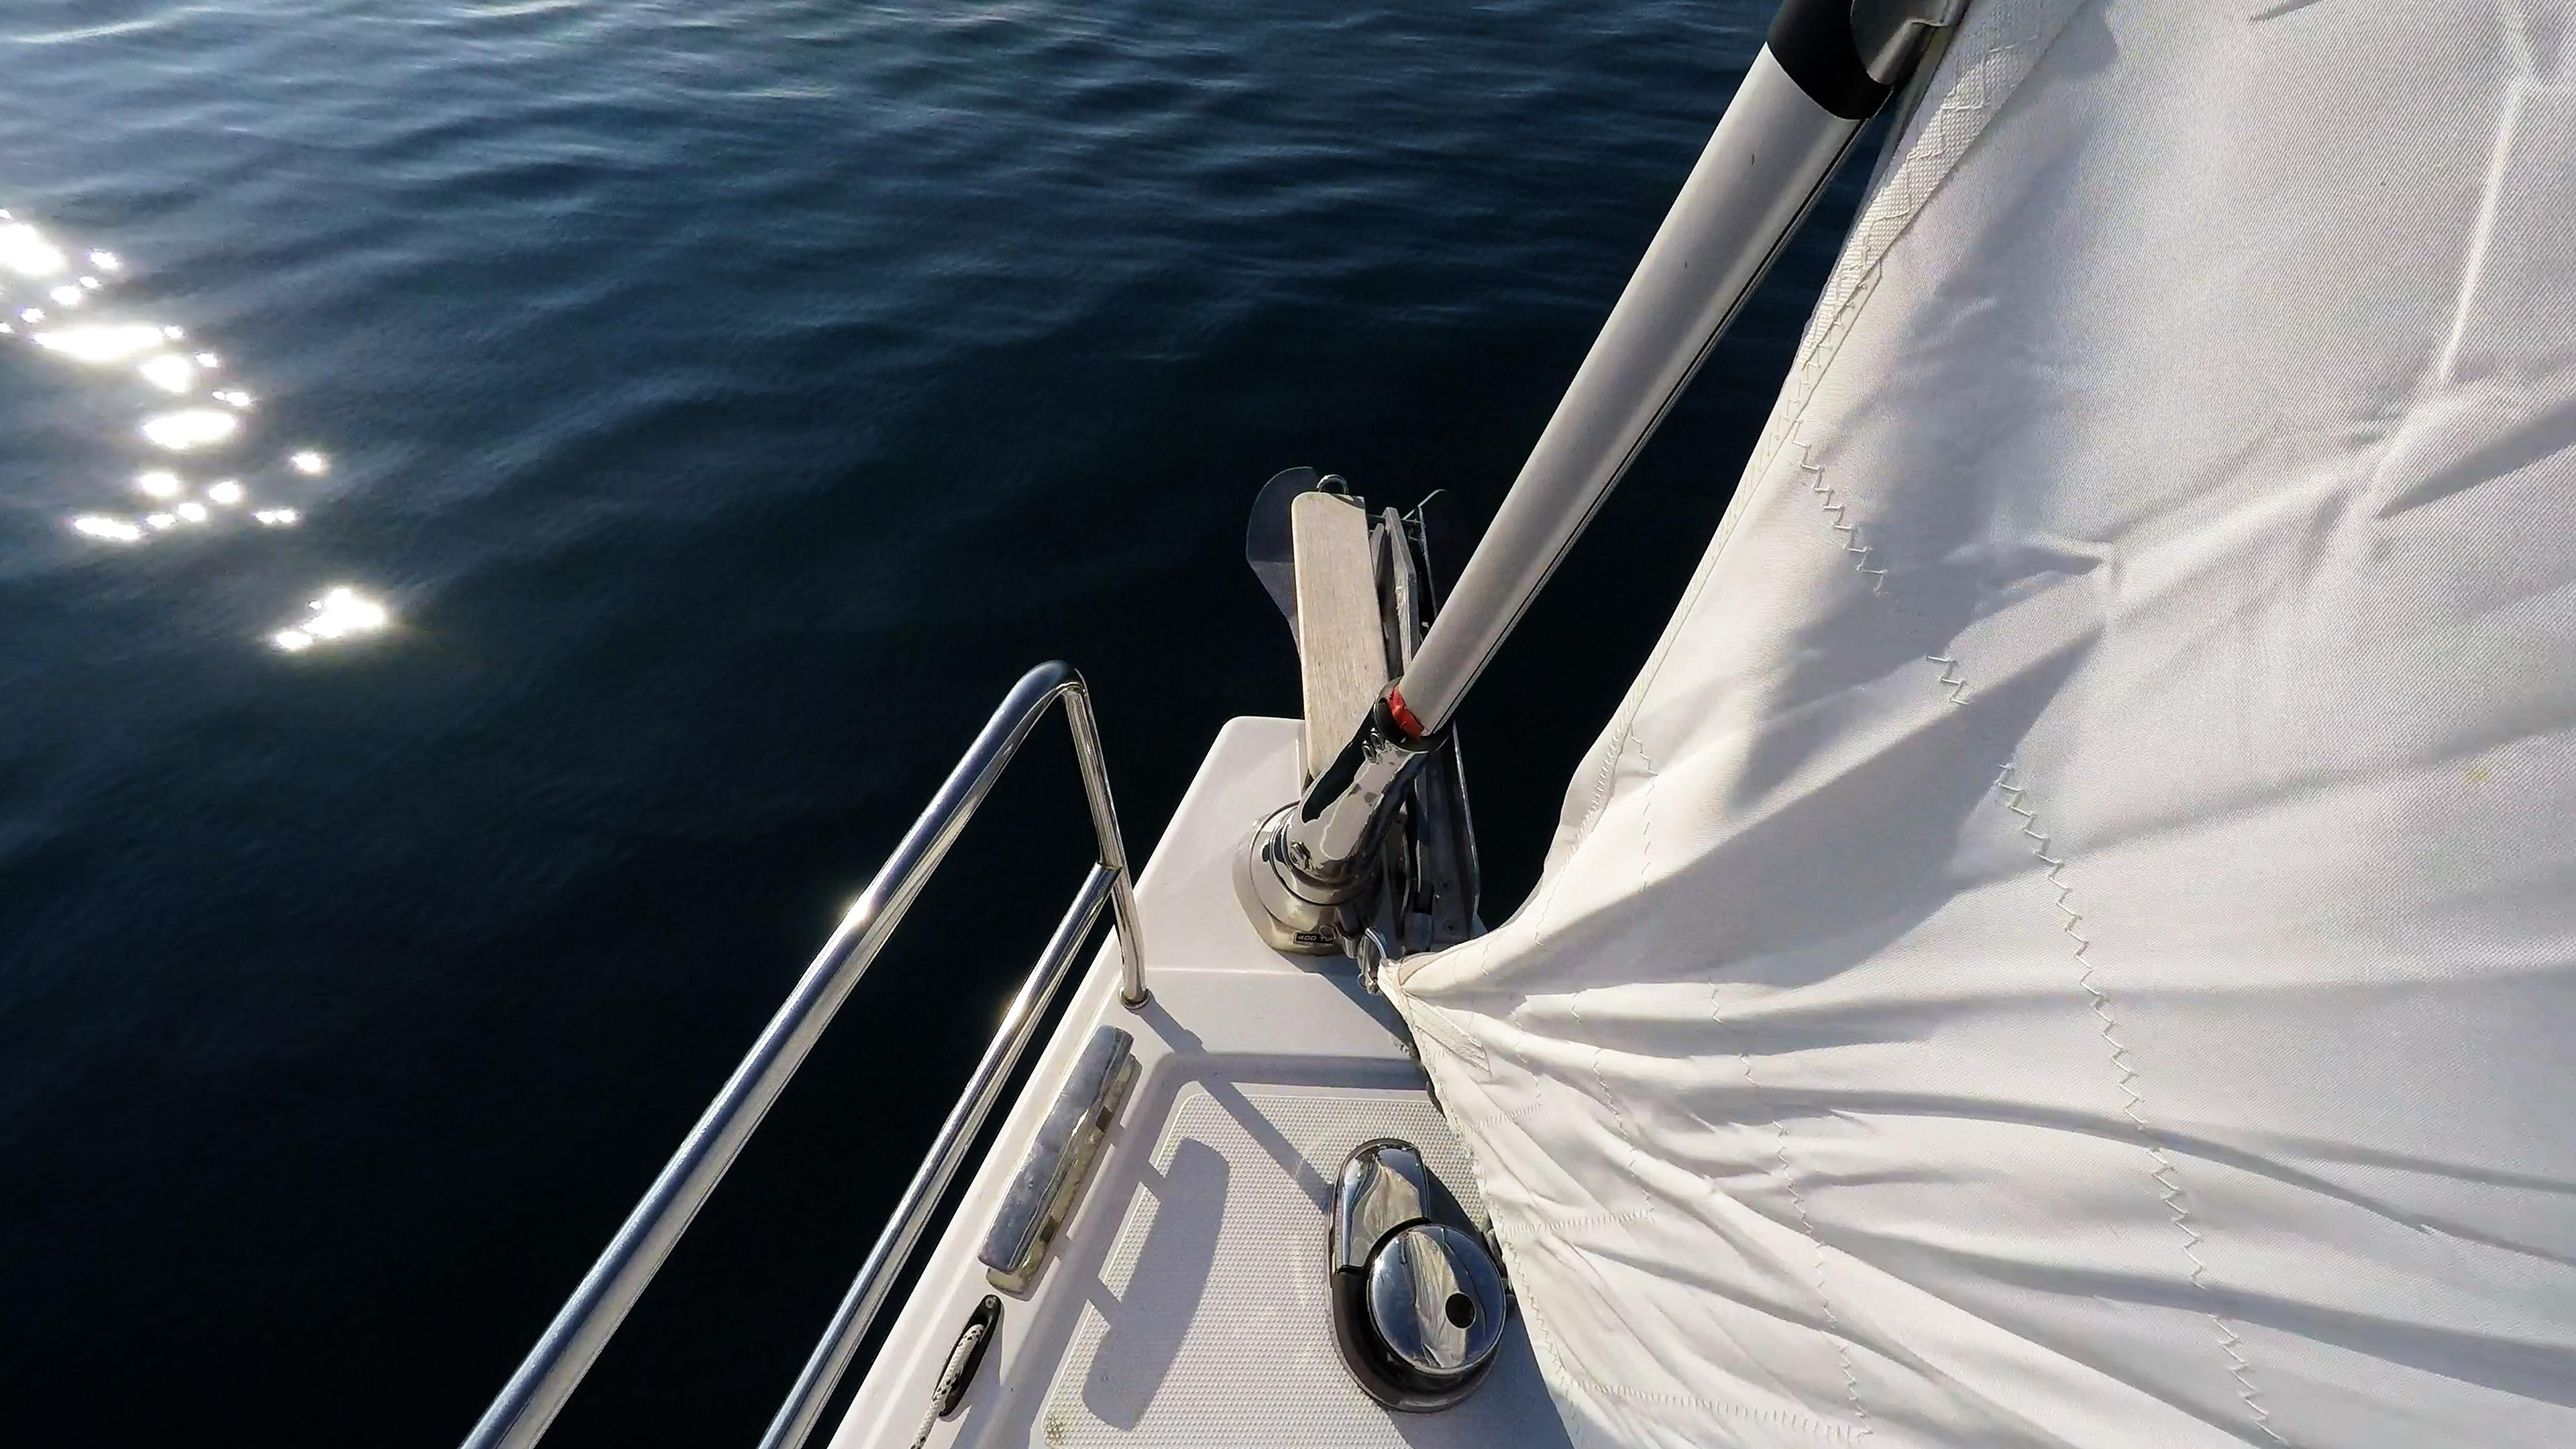 barcha a vela salpa ancora elettrico barca a vela vele genova avvolgibile prua mare sole